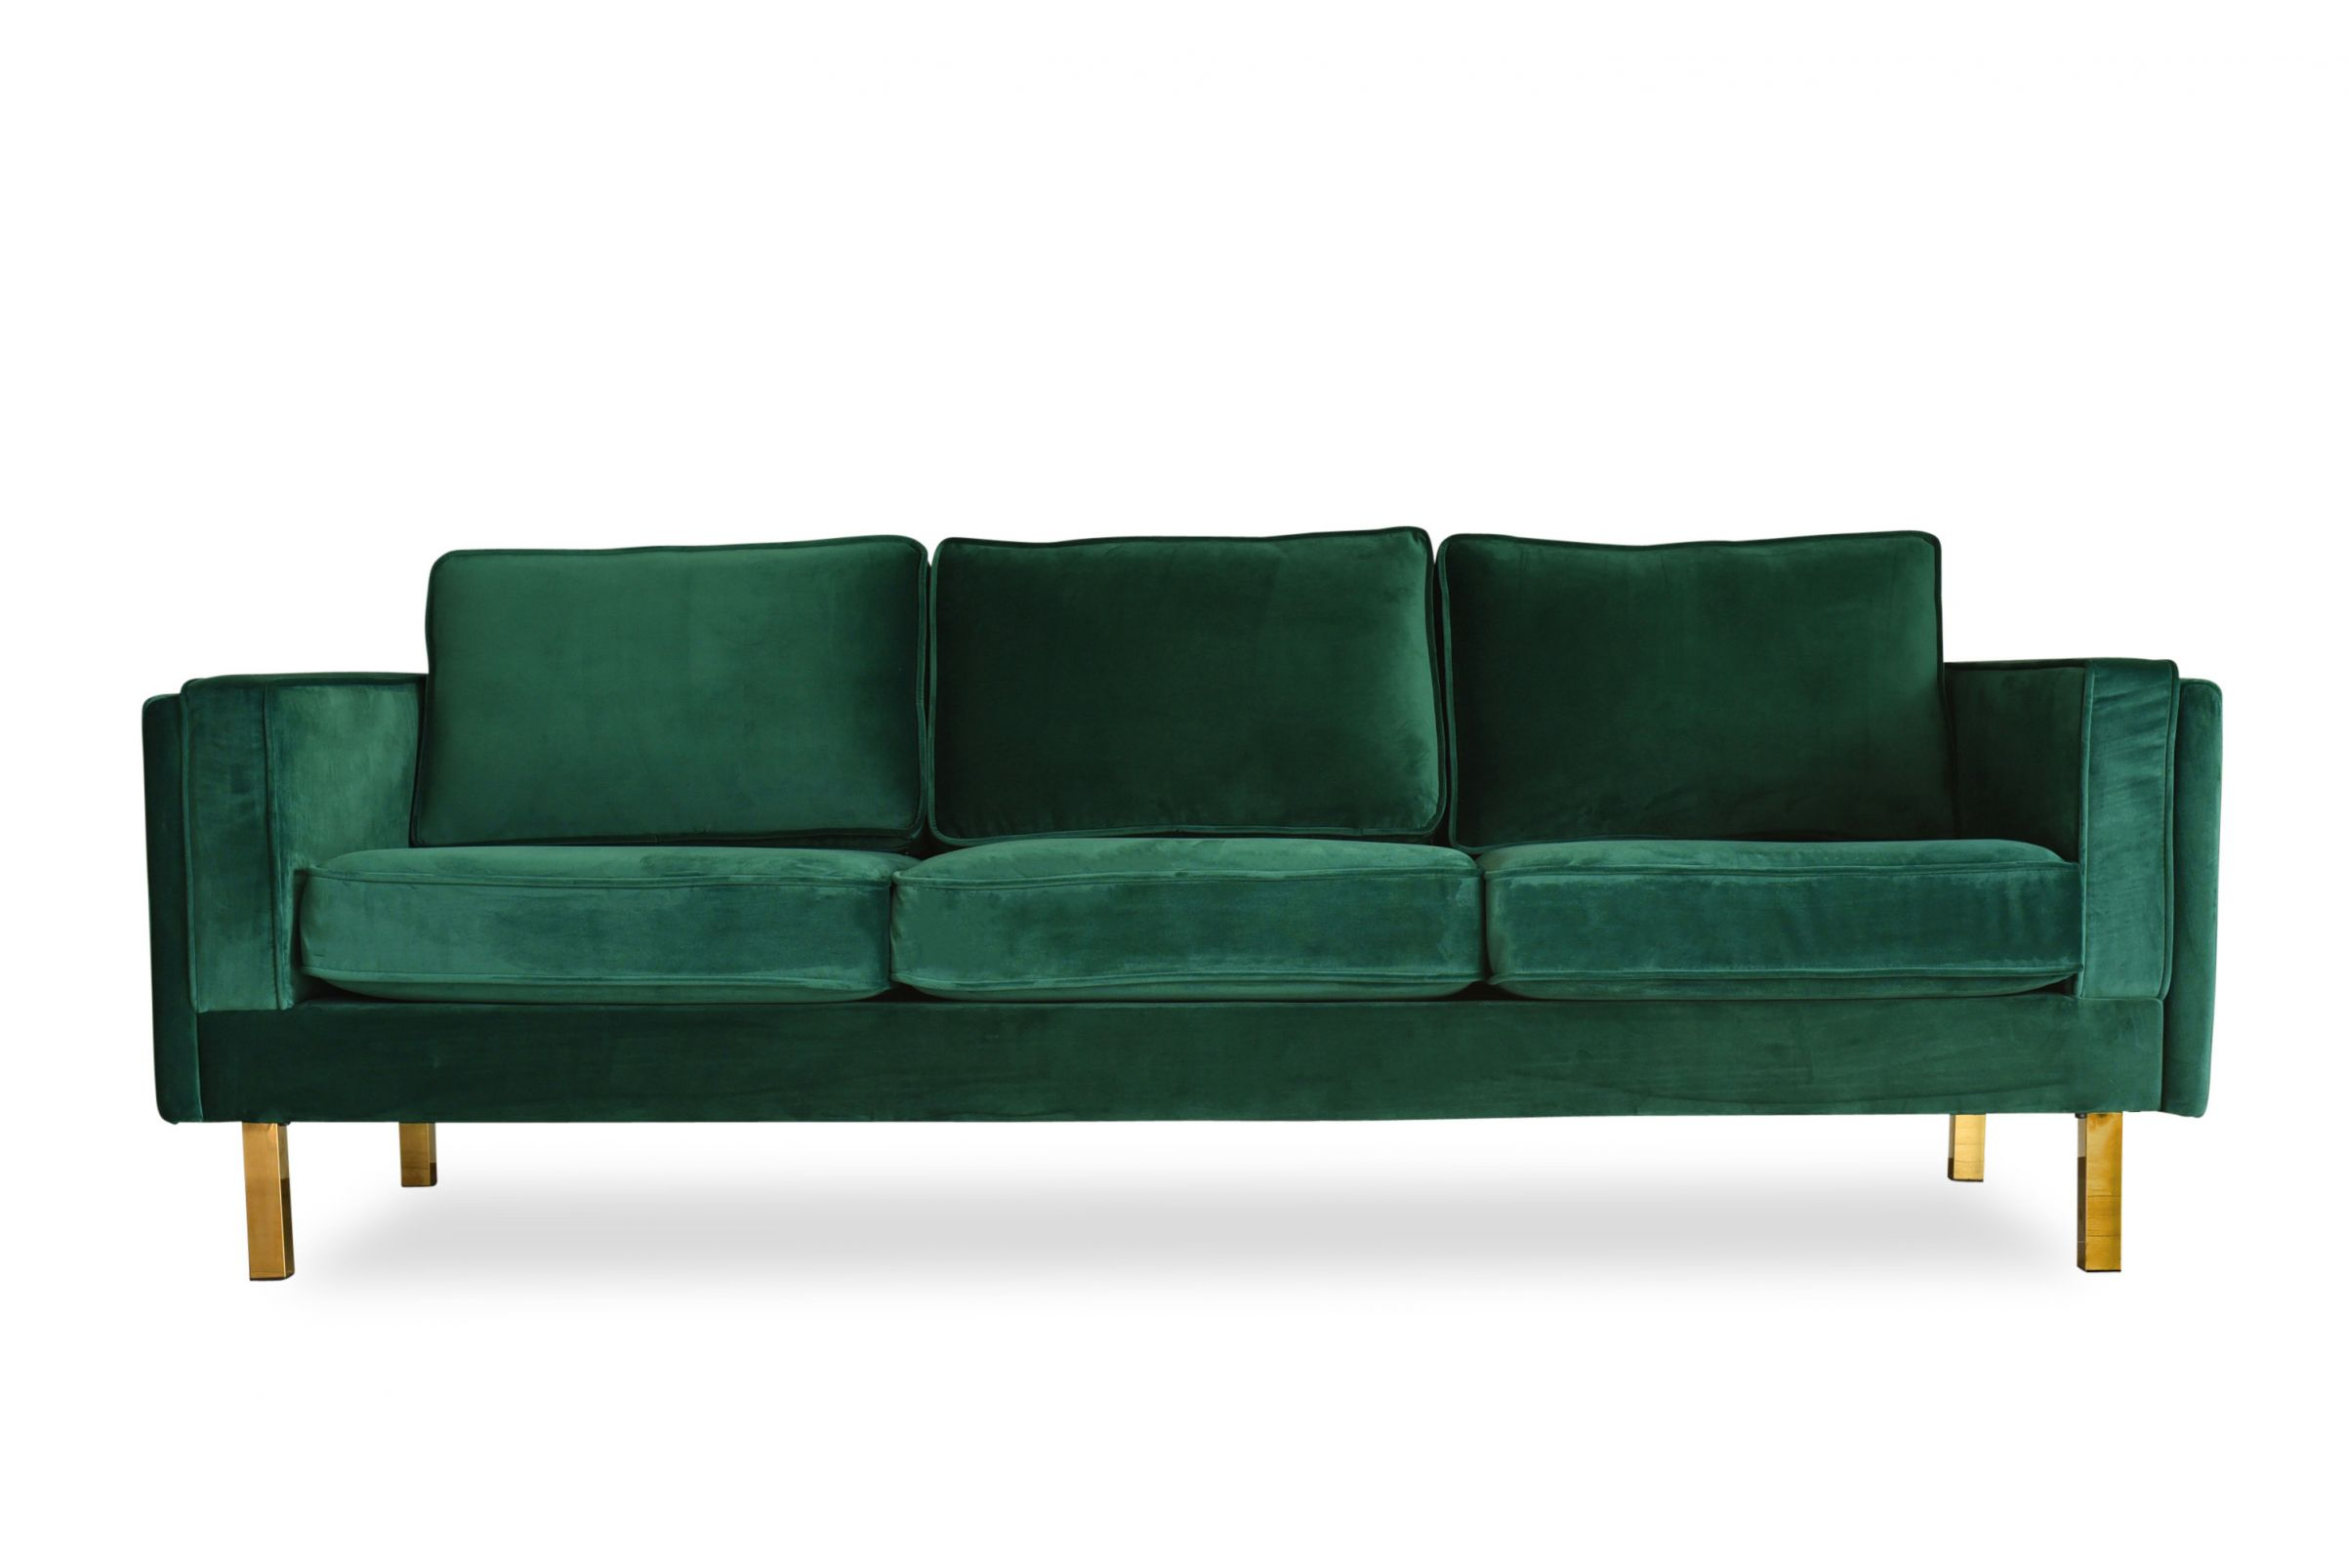 Everly Quinn Claybrooks Mid-Century Modern Sofa & Reviews | Wayfair regarding Unique Mid Century Modern Furniture